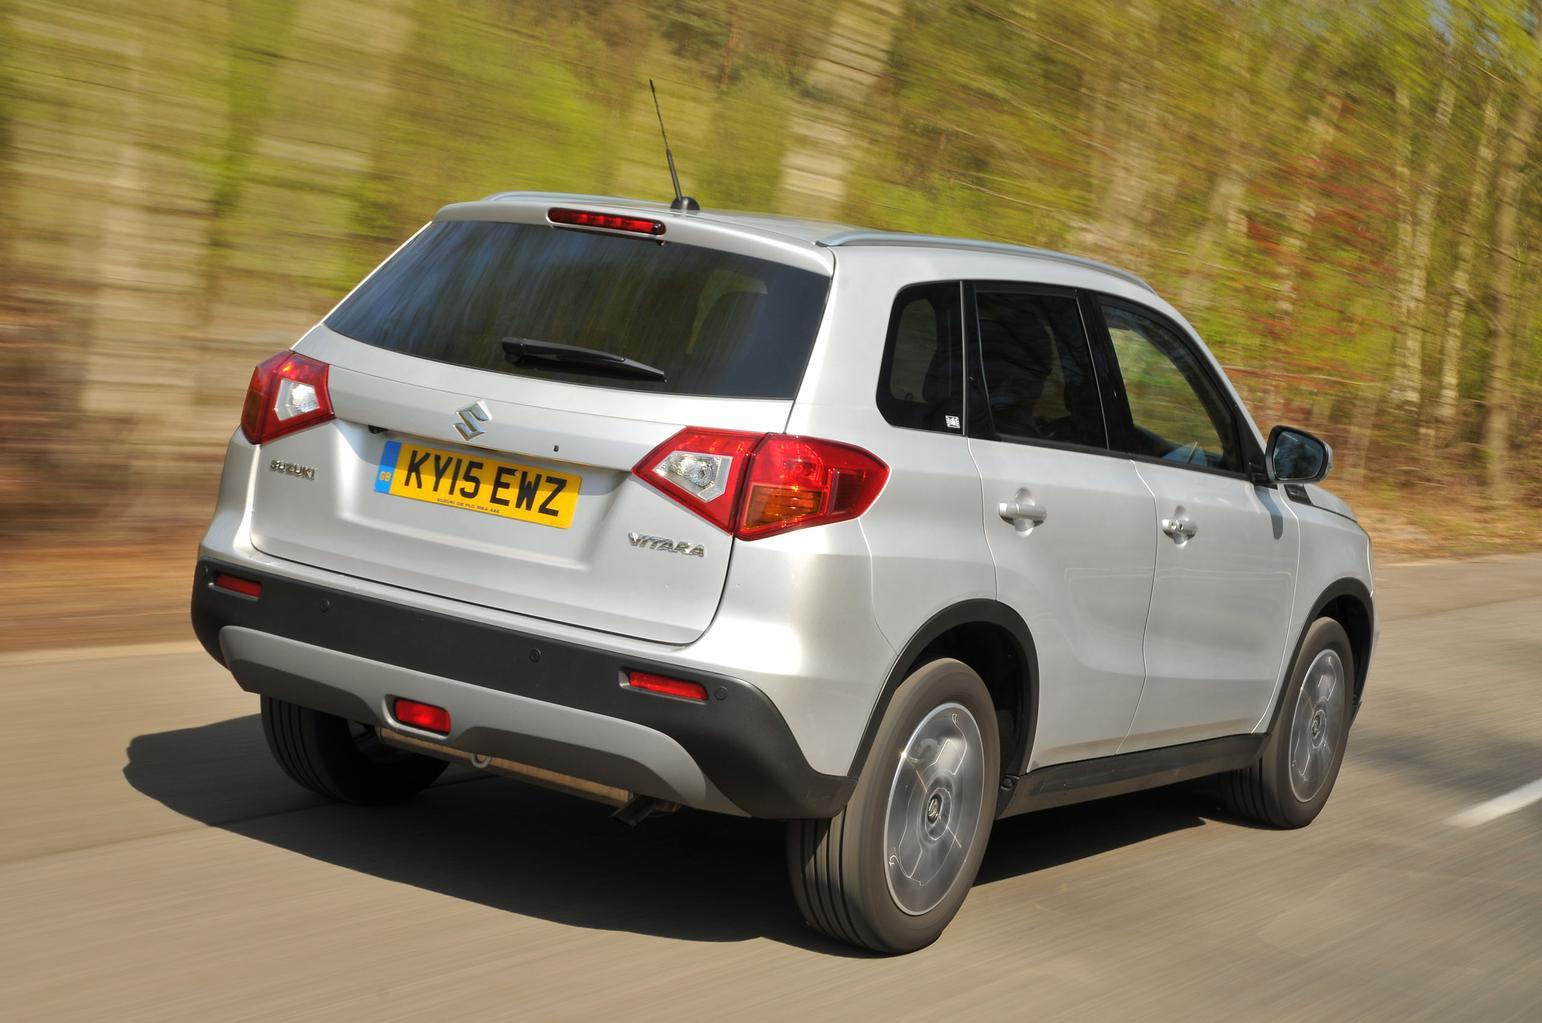 5 reasons to buy a Suzuki Vitara